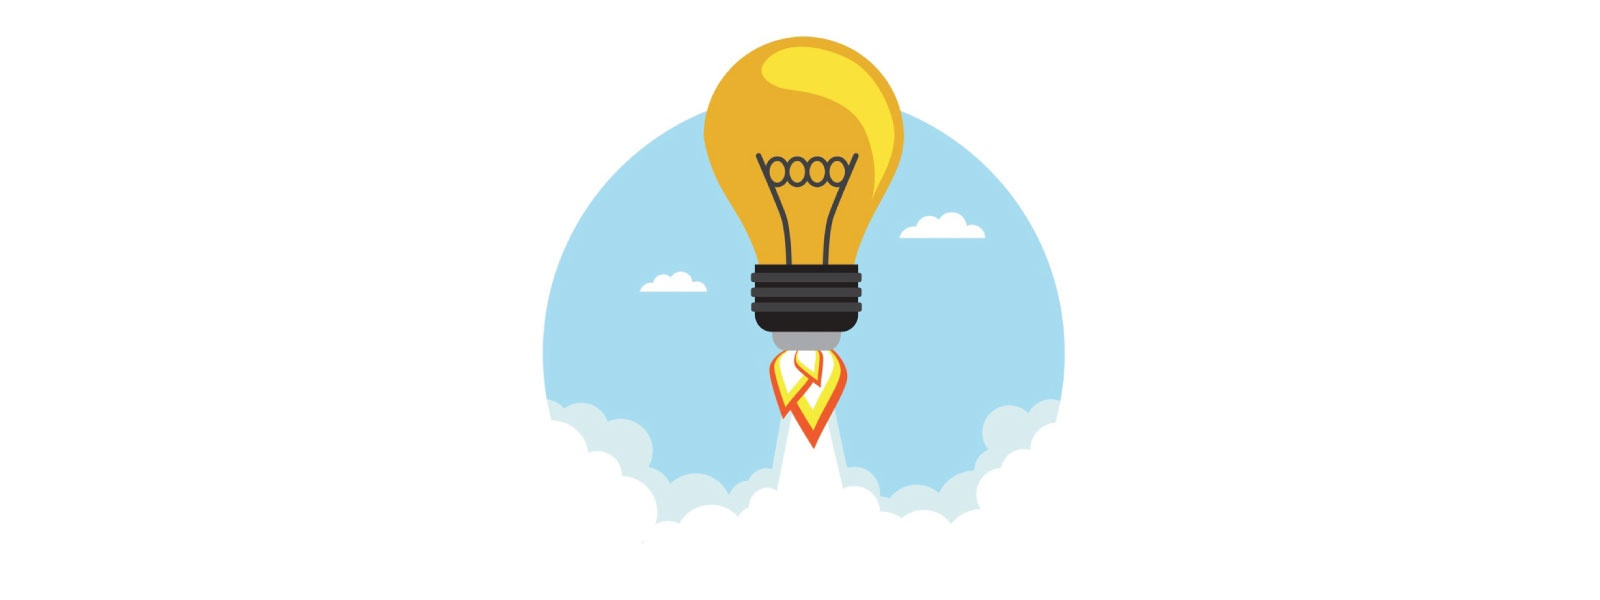 5-Questions-Entrepreneurs-Ask-East-West-rev-2.jpg